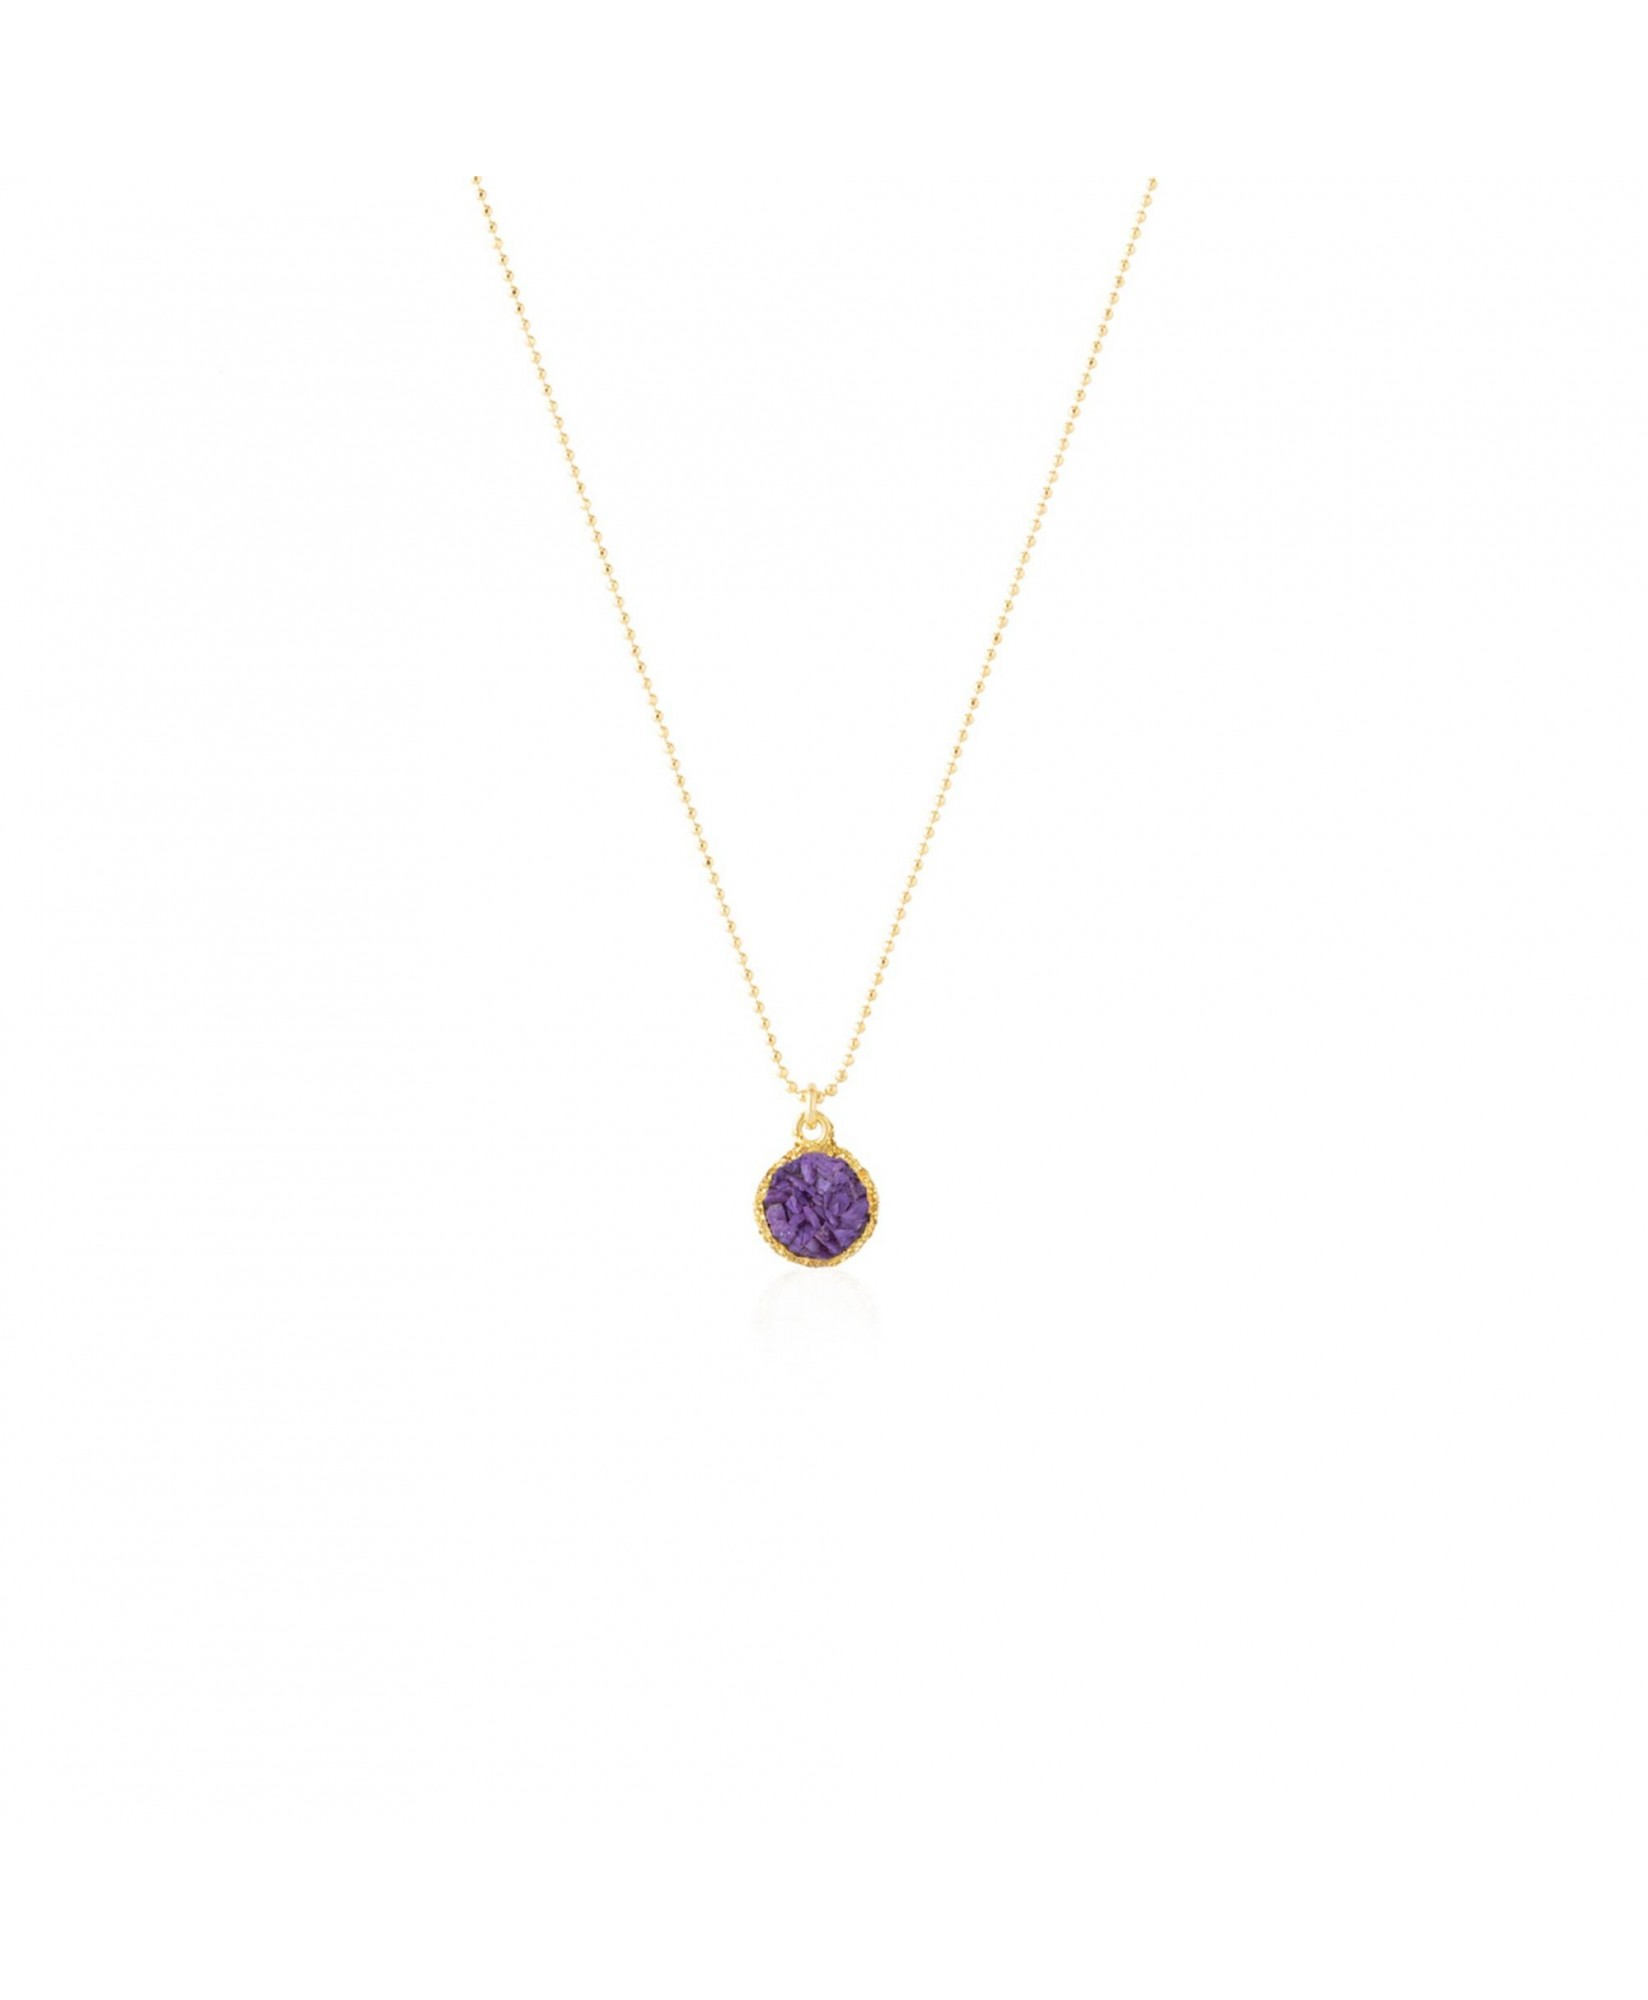 Gargantilla oro colgante redondo Venus con nácar violeta Gargantilla oro colgante redondo Venus con nácar violeta